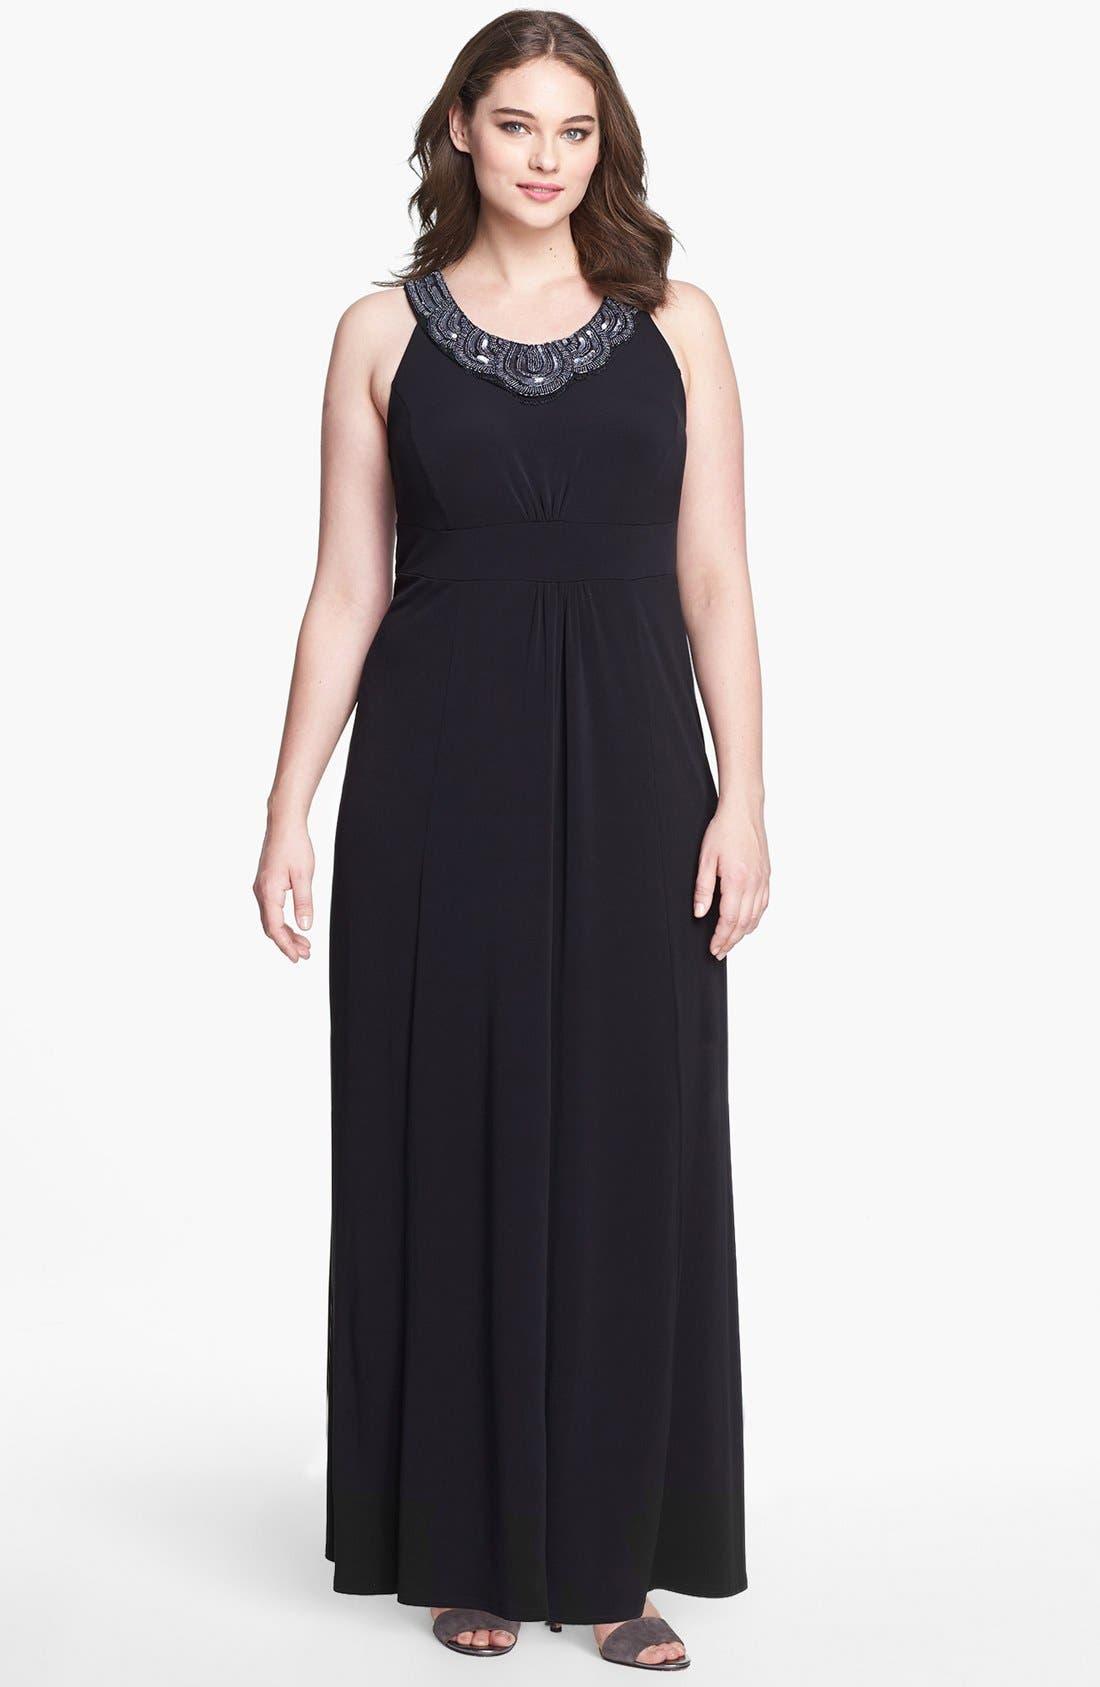 Alternate Image 1 Selected - Evans Embellished Jersey Maxi Dress (Plus Size)